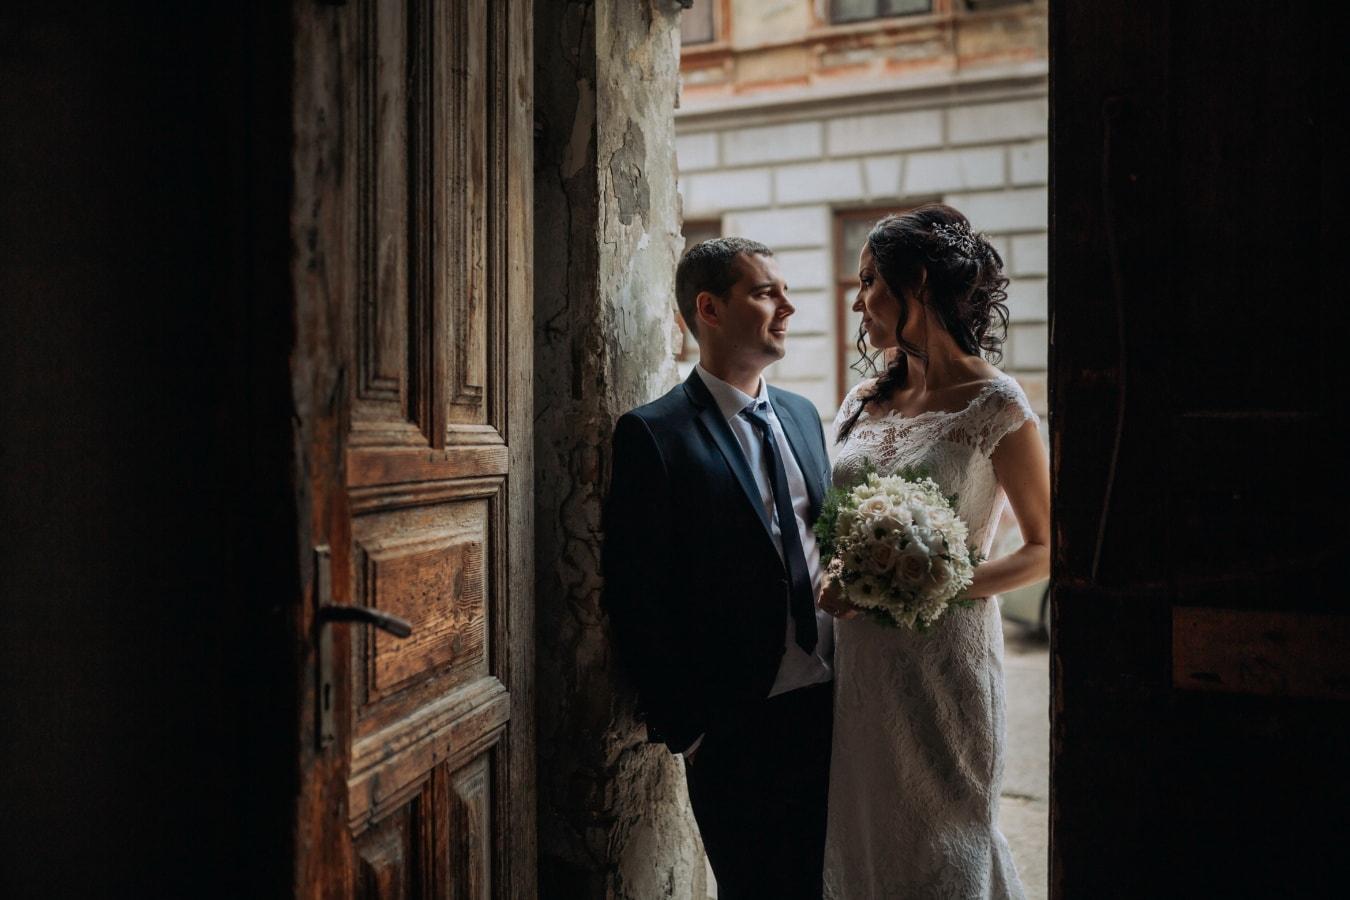 front door, entrance, shadow, just married, groom, bride, woman, wedding, man, people